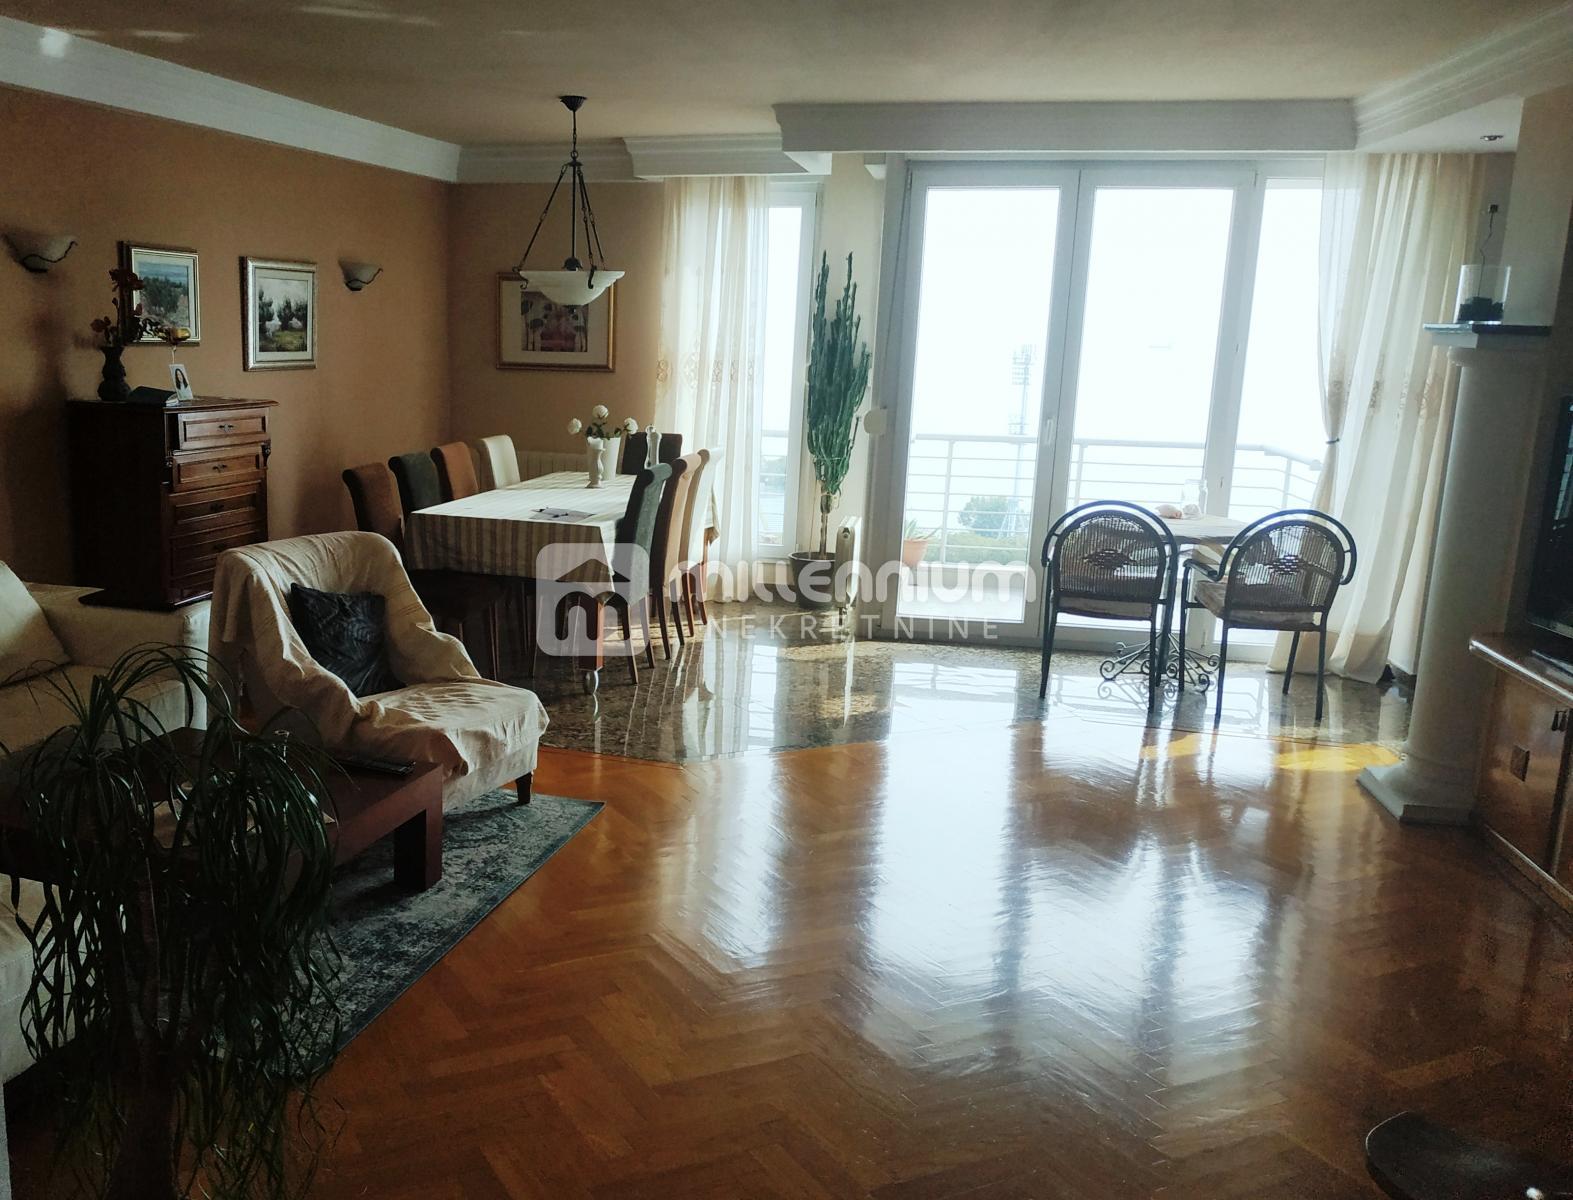 Rijeka, Kantrida, dvoetažni 4s+db, 2 balkona, terasa i garaža